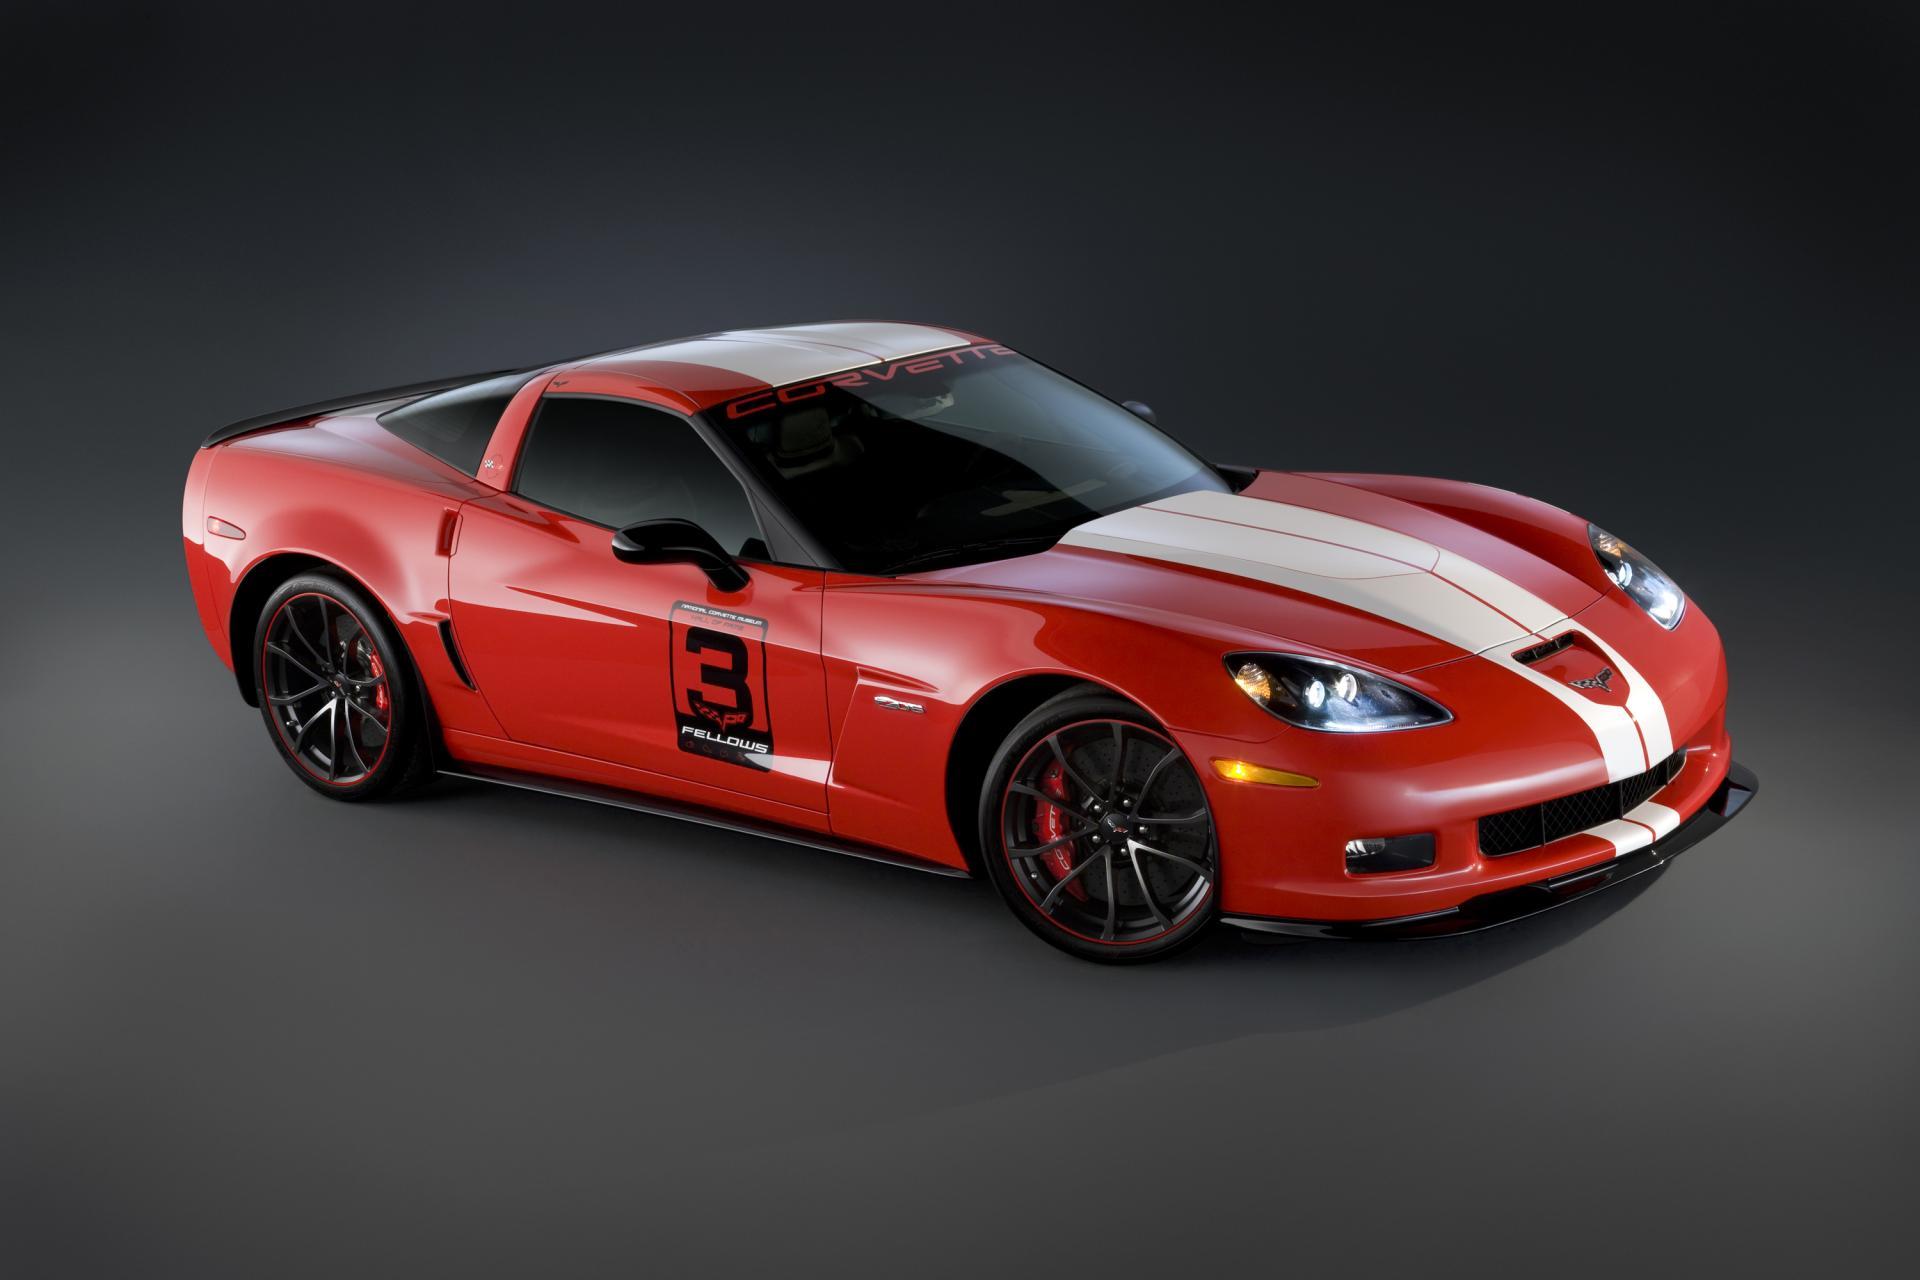 2012 Chevrolet Corvette Z06 Ron Fellows Tribute News and Information